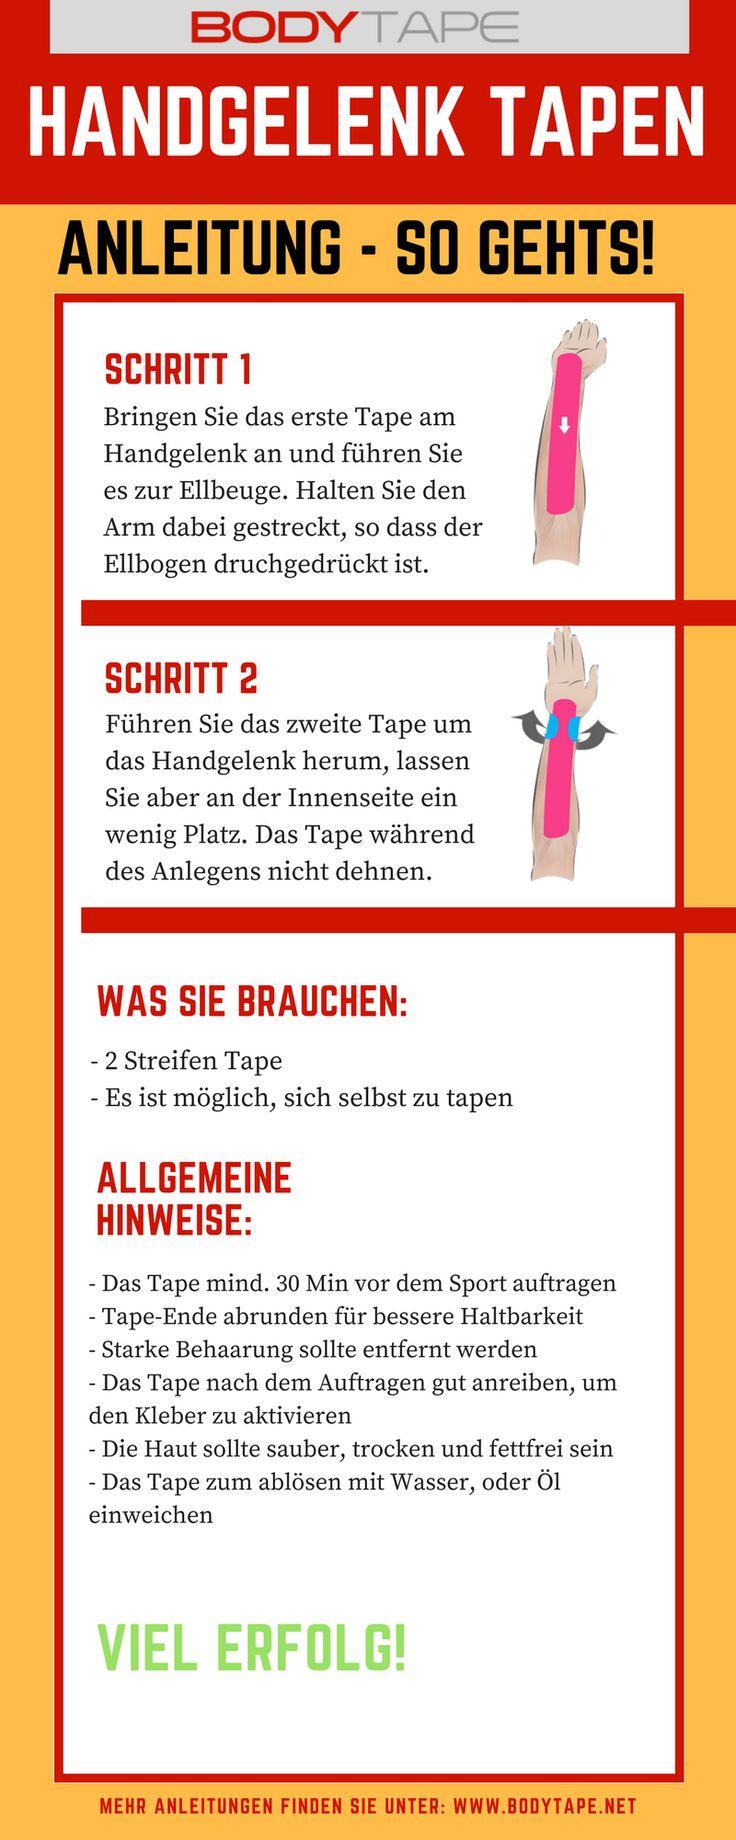 Handgelenk Tapen Anleitung - Kinesiologie Tape Anleitung zum selber Tapen des Handgelenk. Mehr Anleitungen unter: http://taping-guide.com